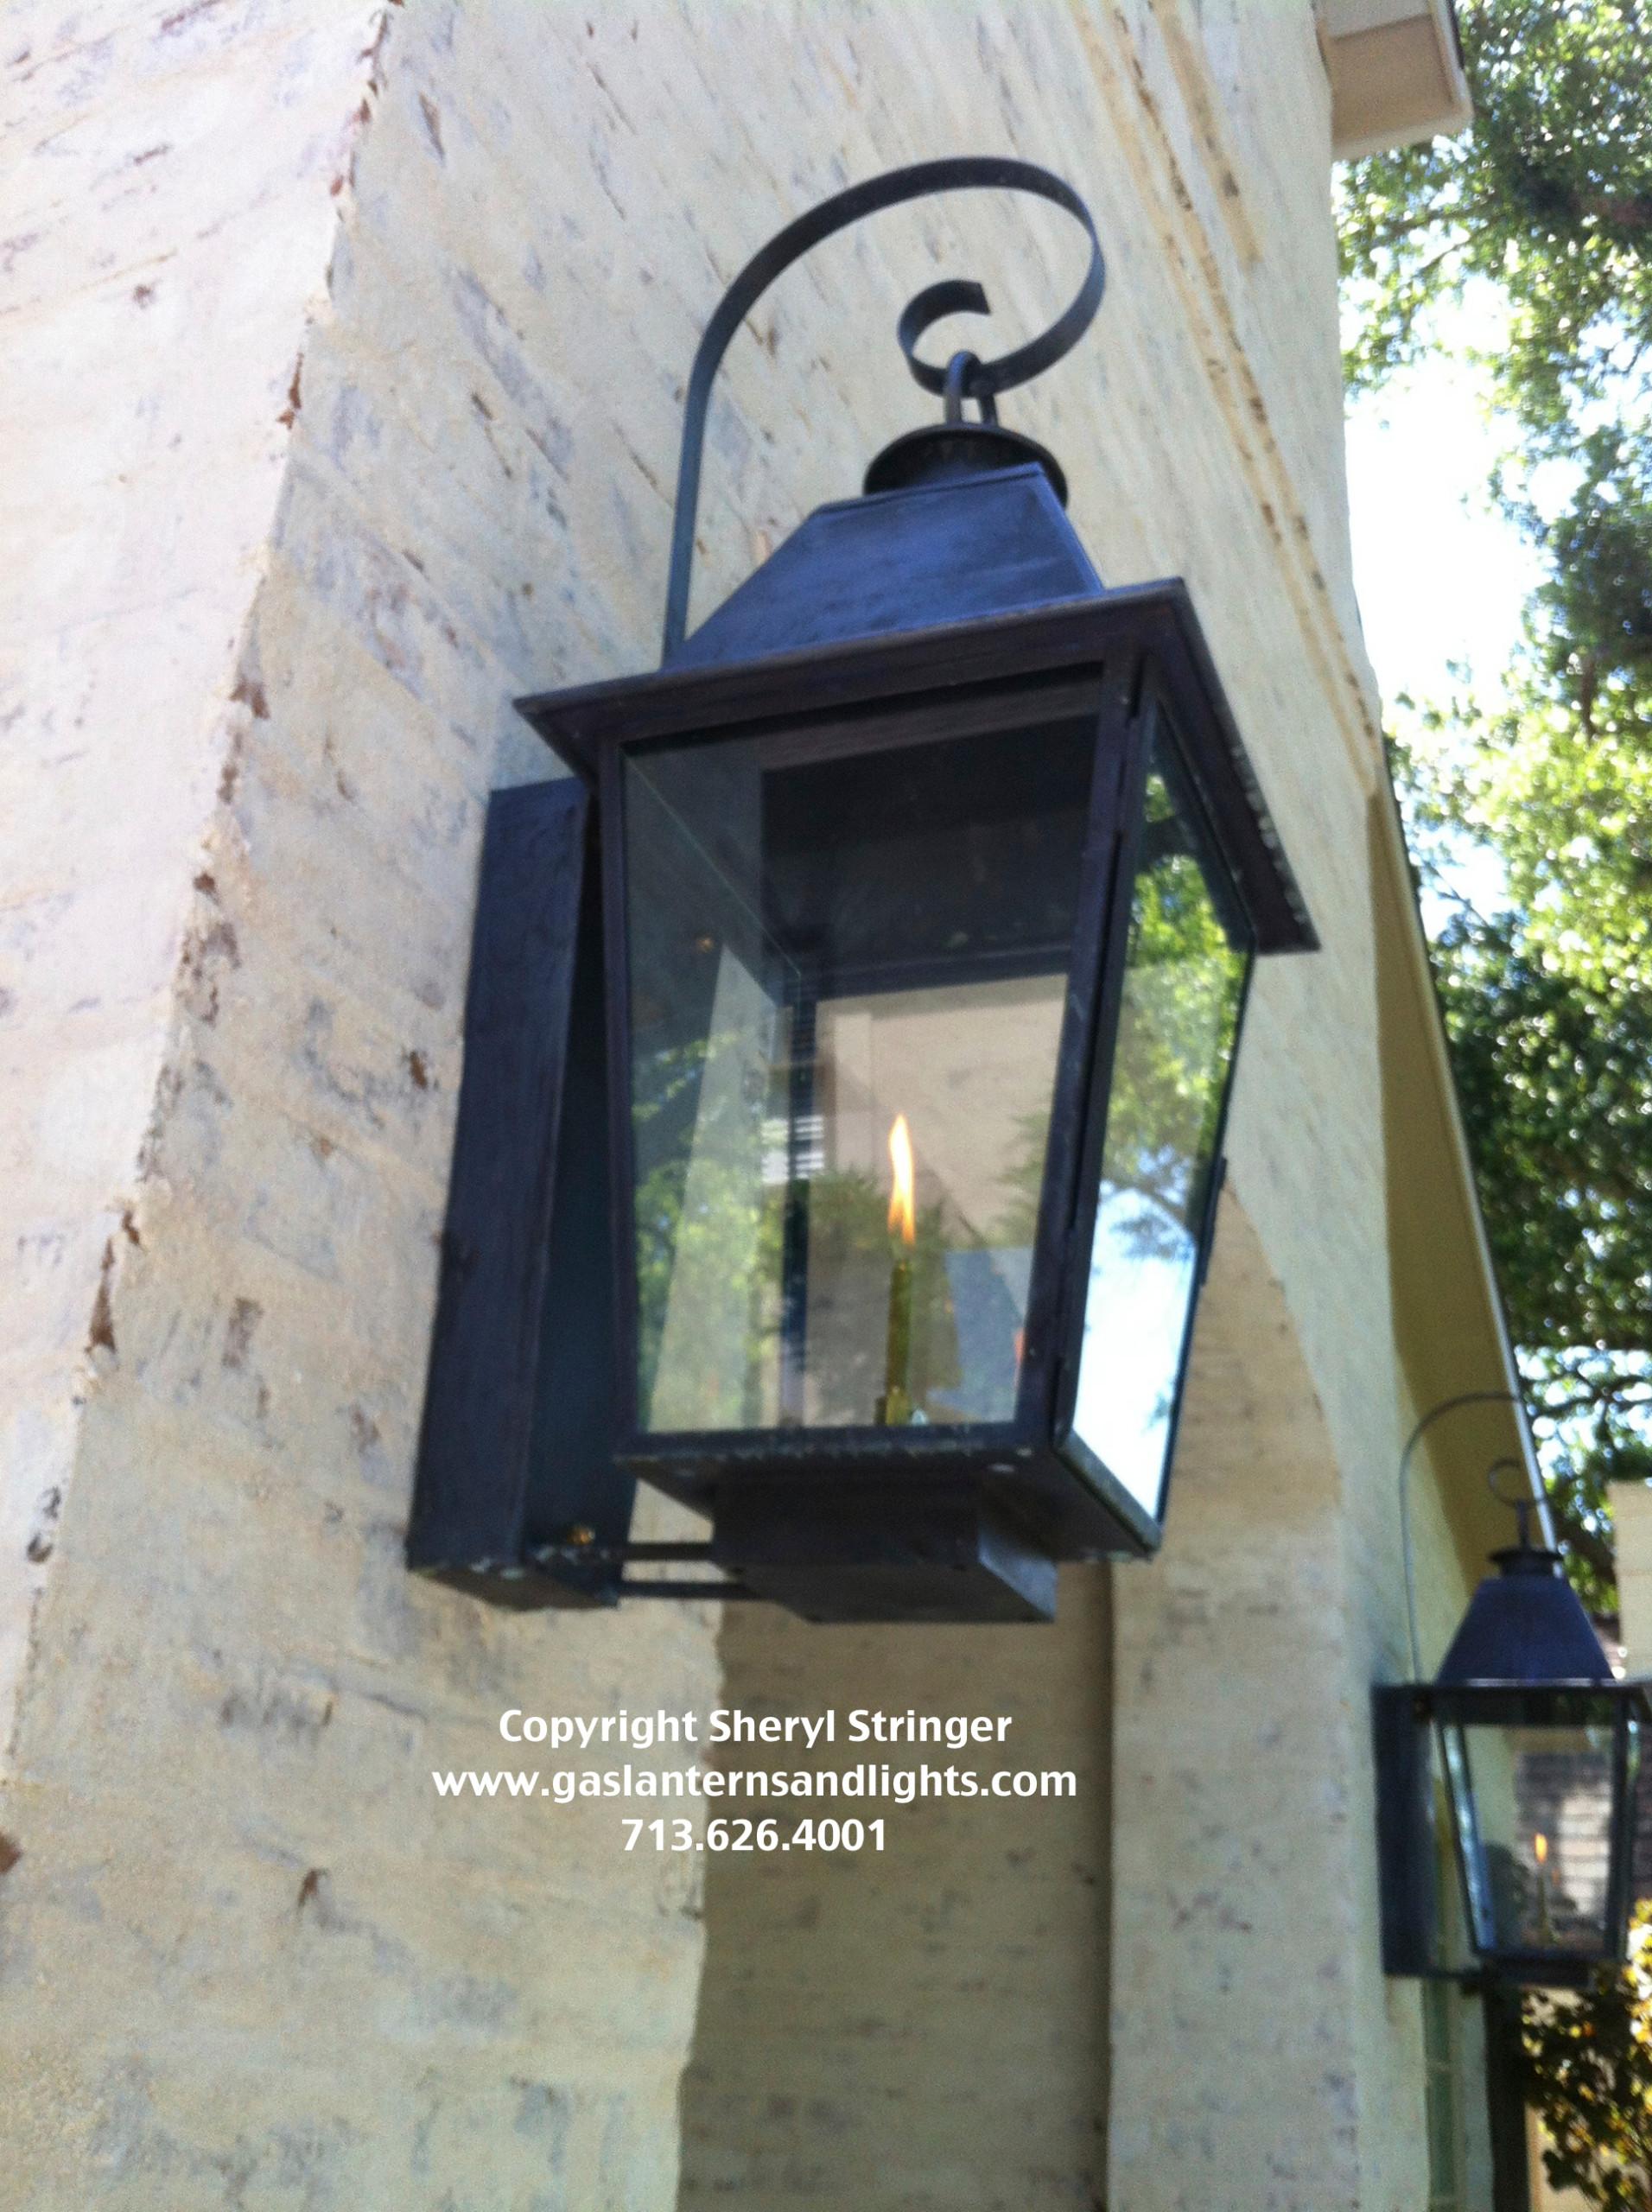 Sheryl's Plantation Style Gas Lantern